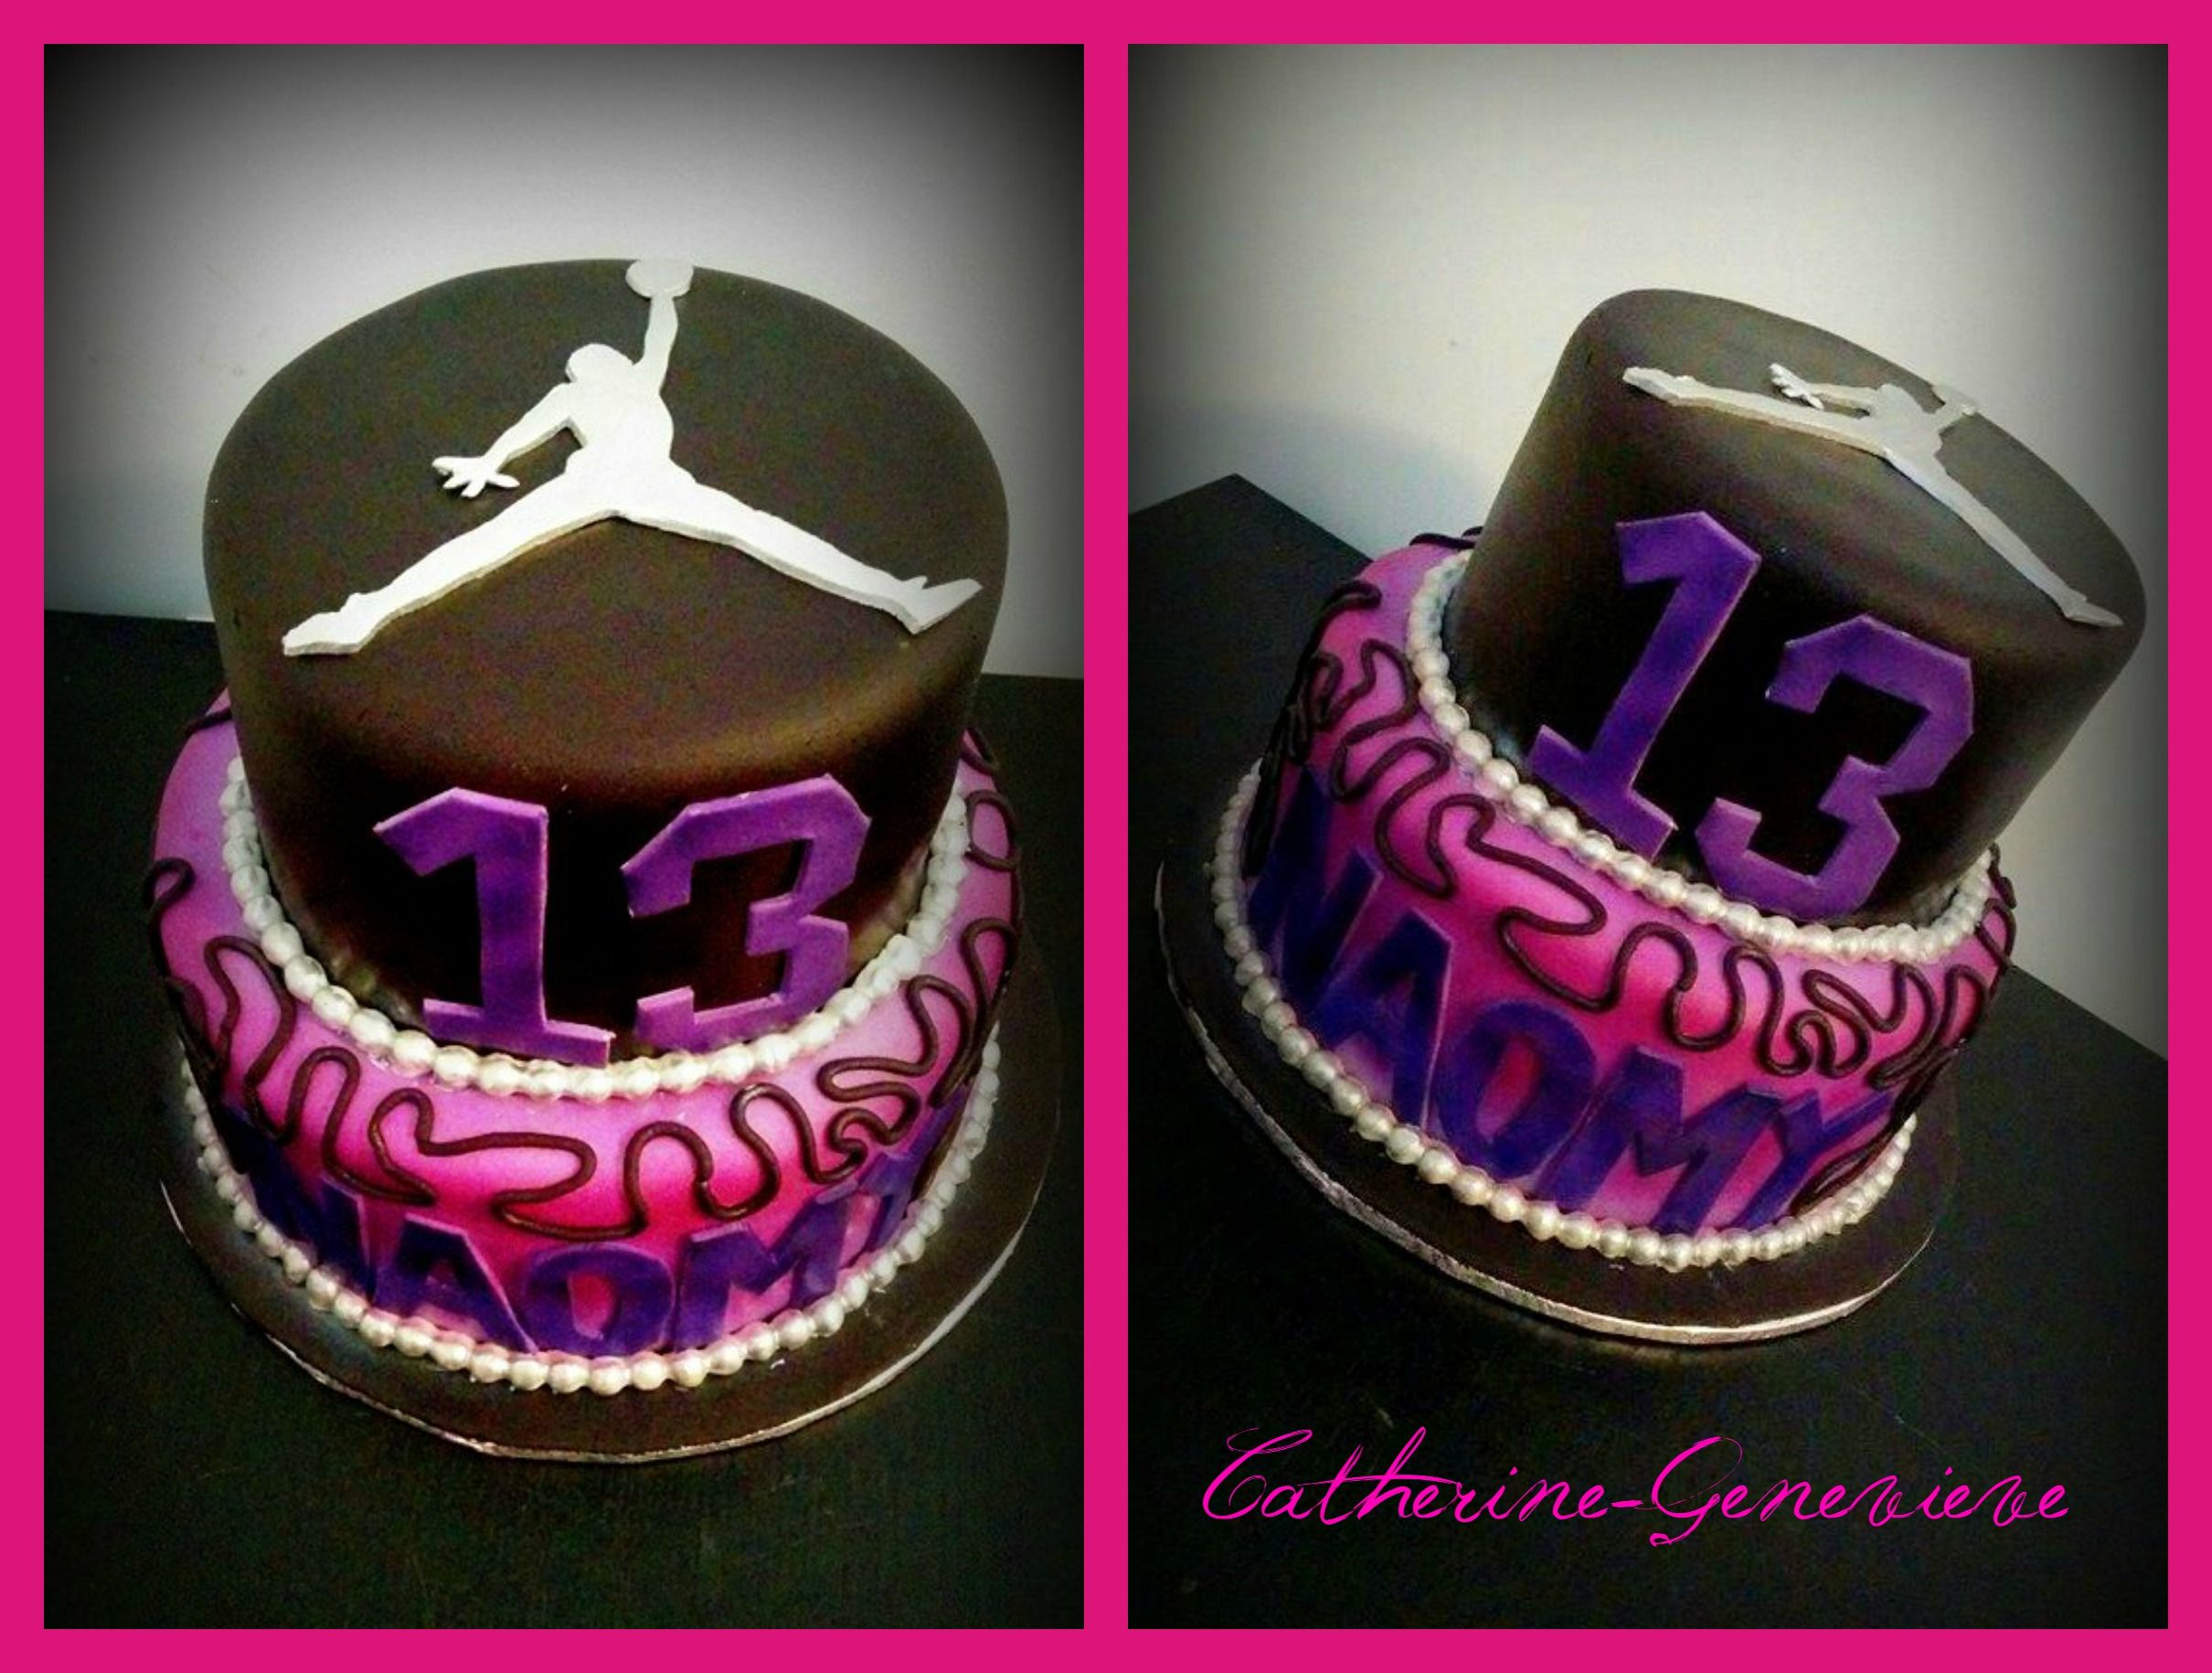 Basketball Jordan Cake for girl Cake and cupcake decorating